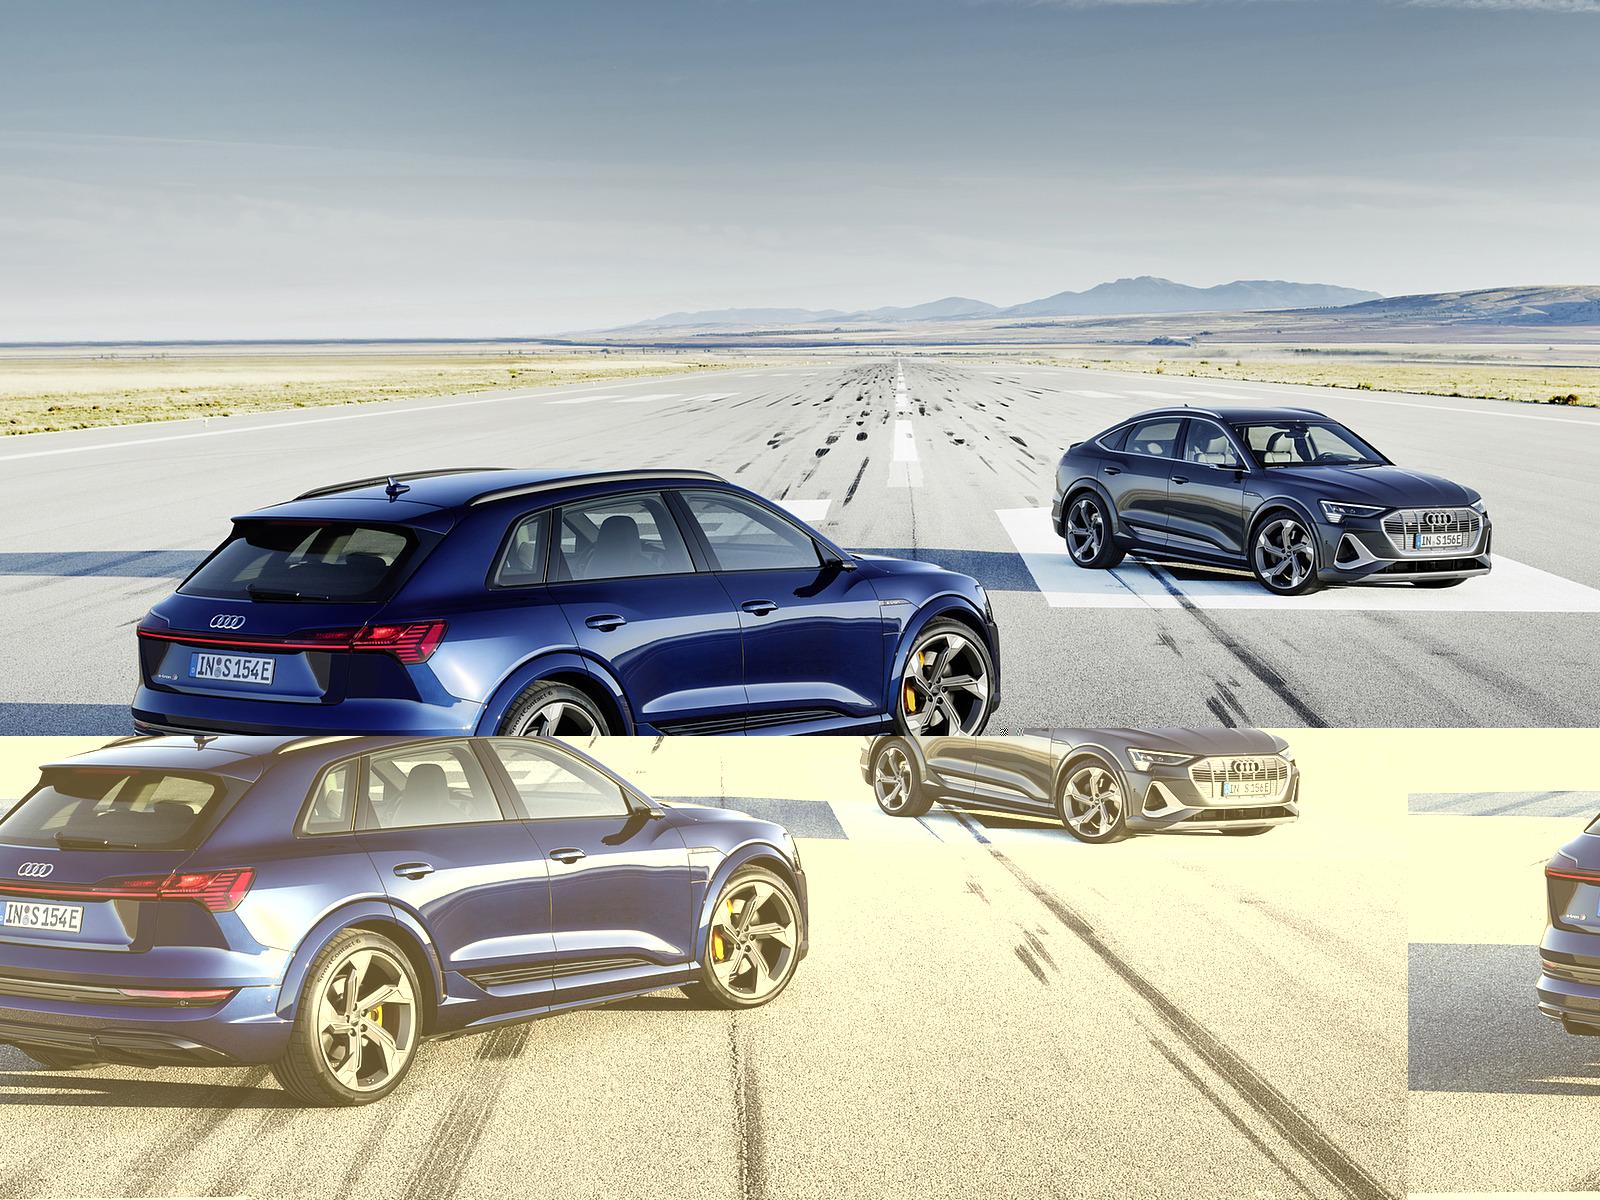 2021 Audi e-tron S (Color: Navarra Blue) and e-tron S Sportback Wallpapers (7)